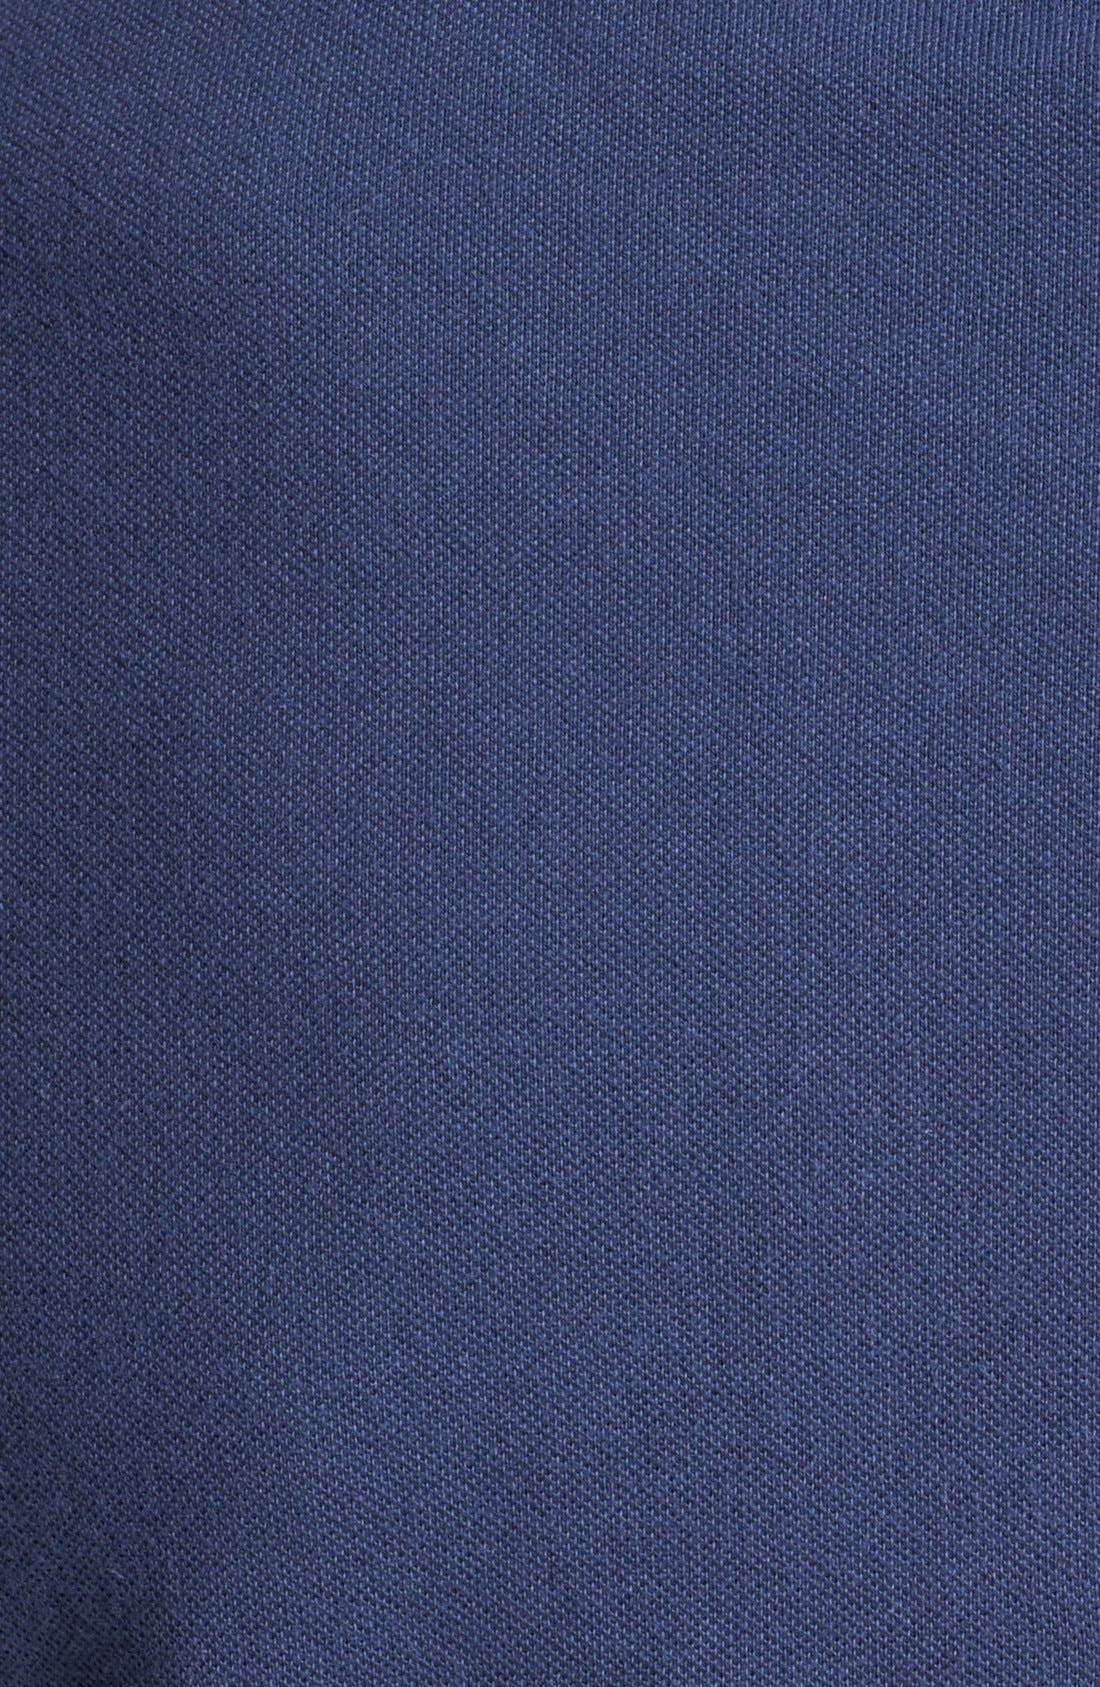 Alternate Image 3  - Neil Barrett Print Piqué Polo